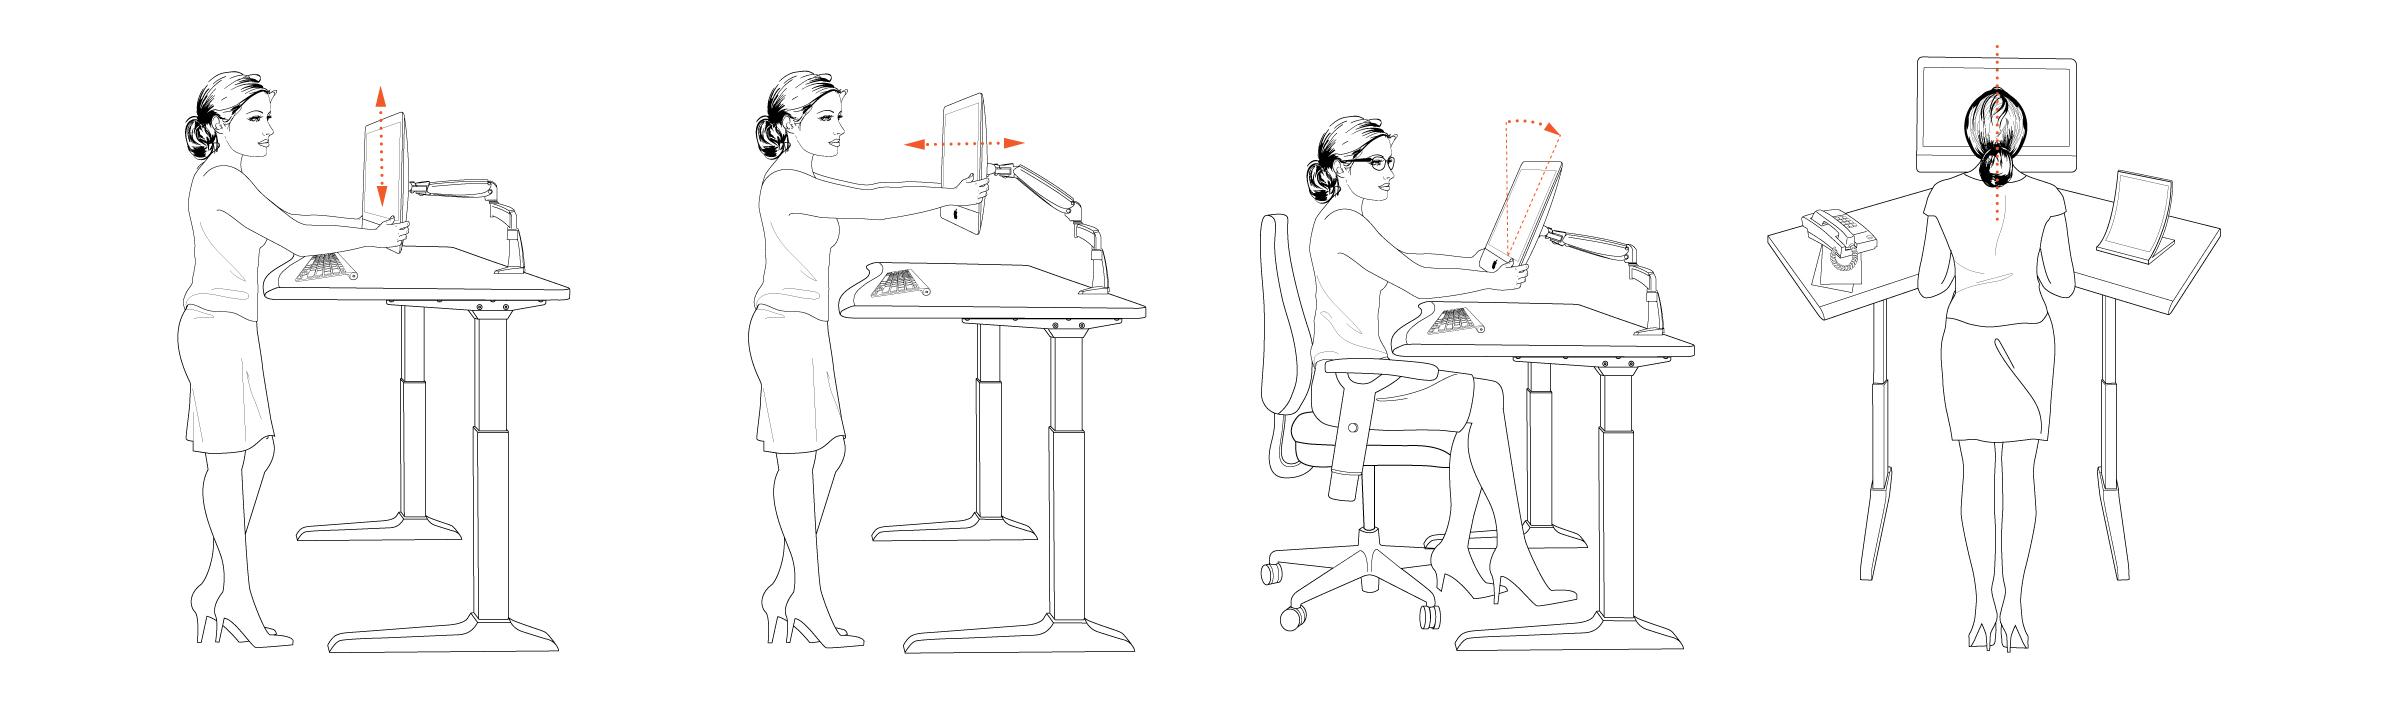 Ergonomics For Standing Desks  Hostgarcia